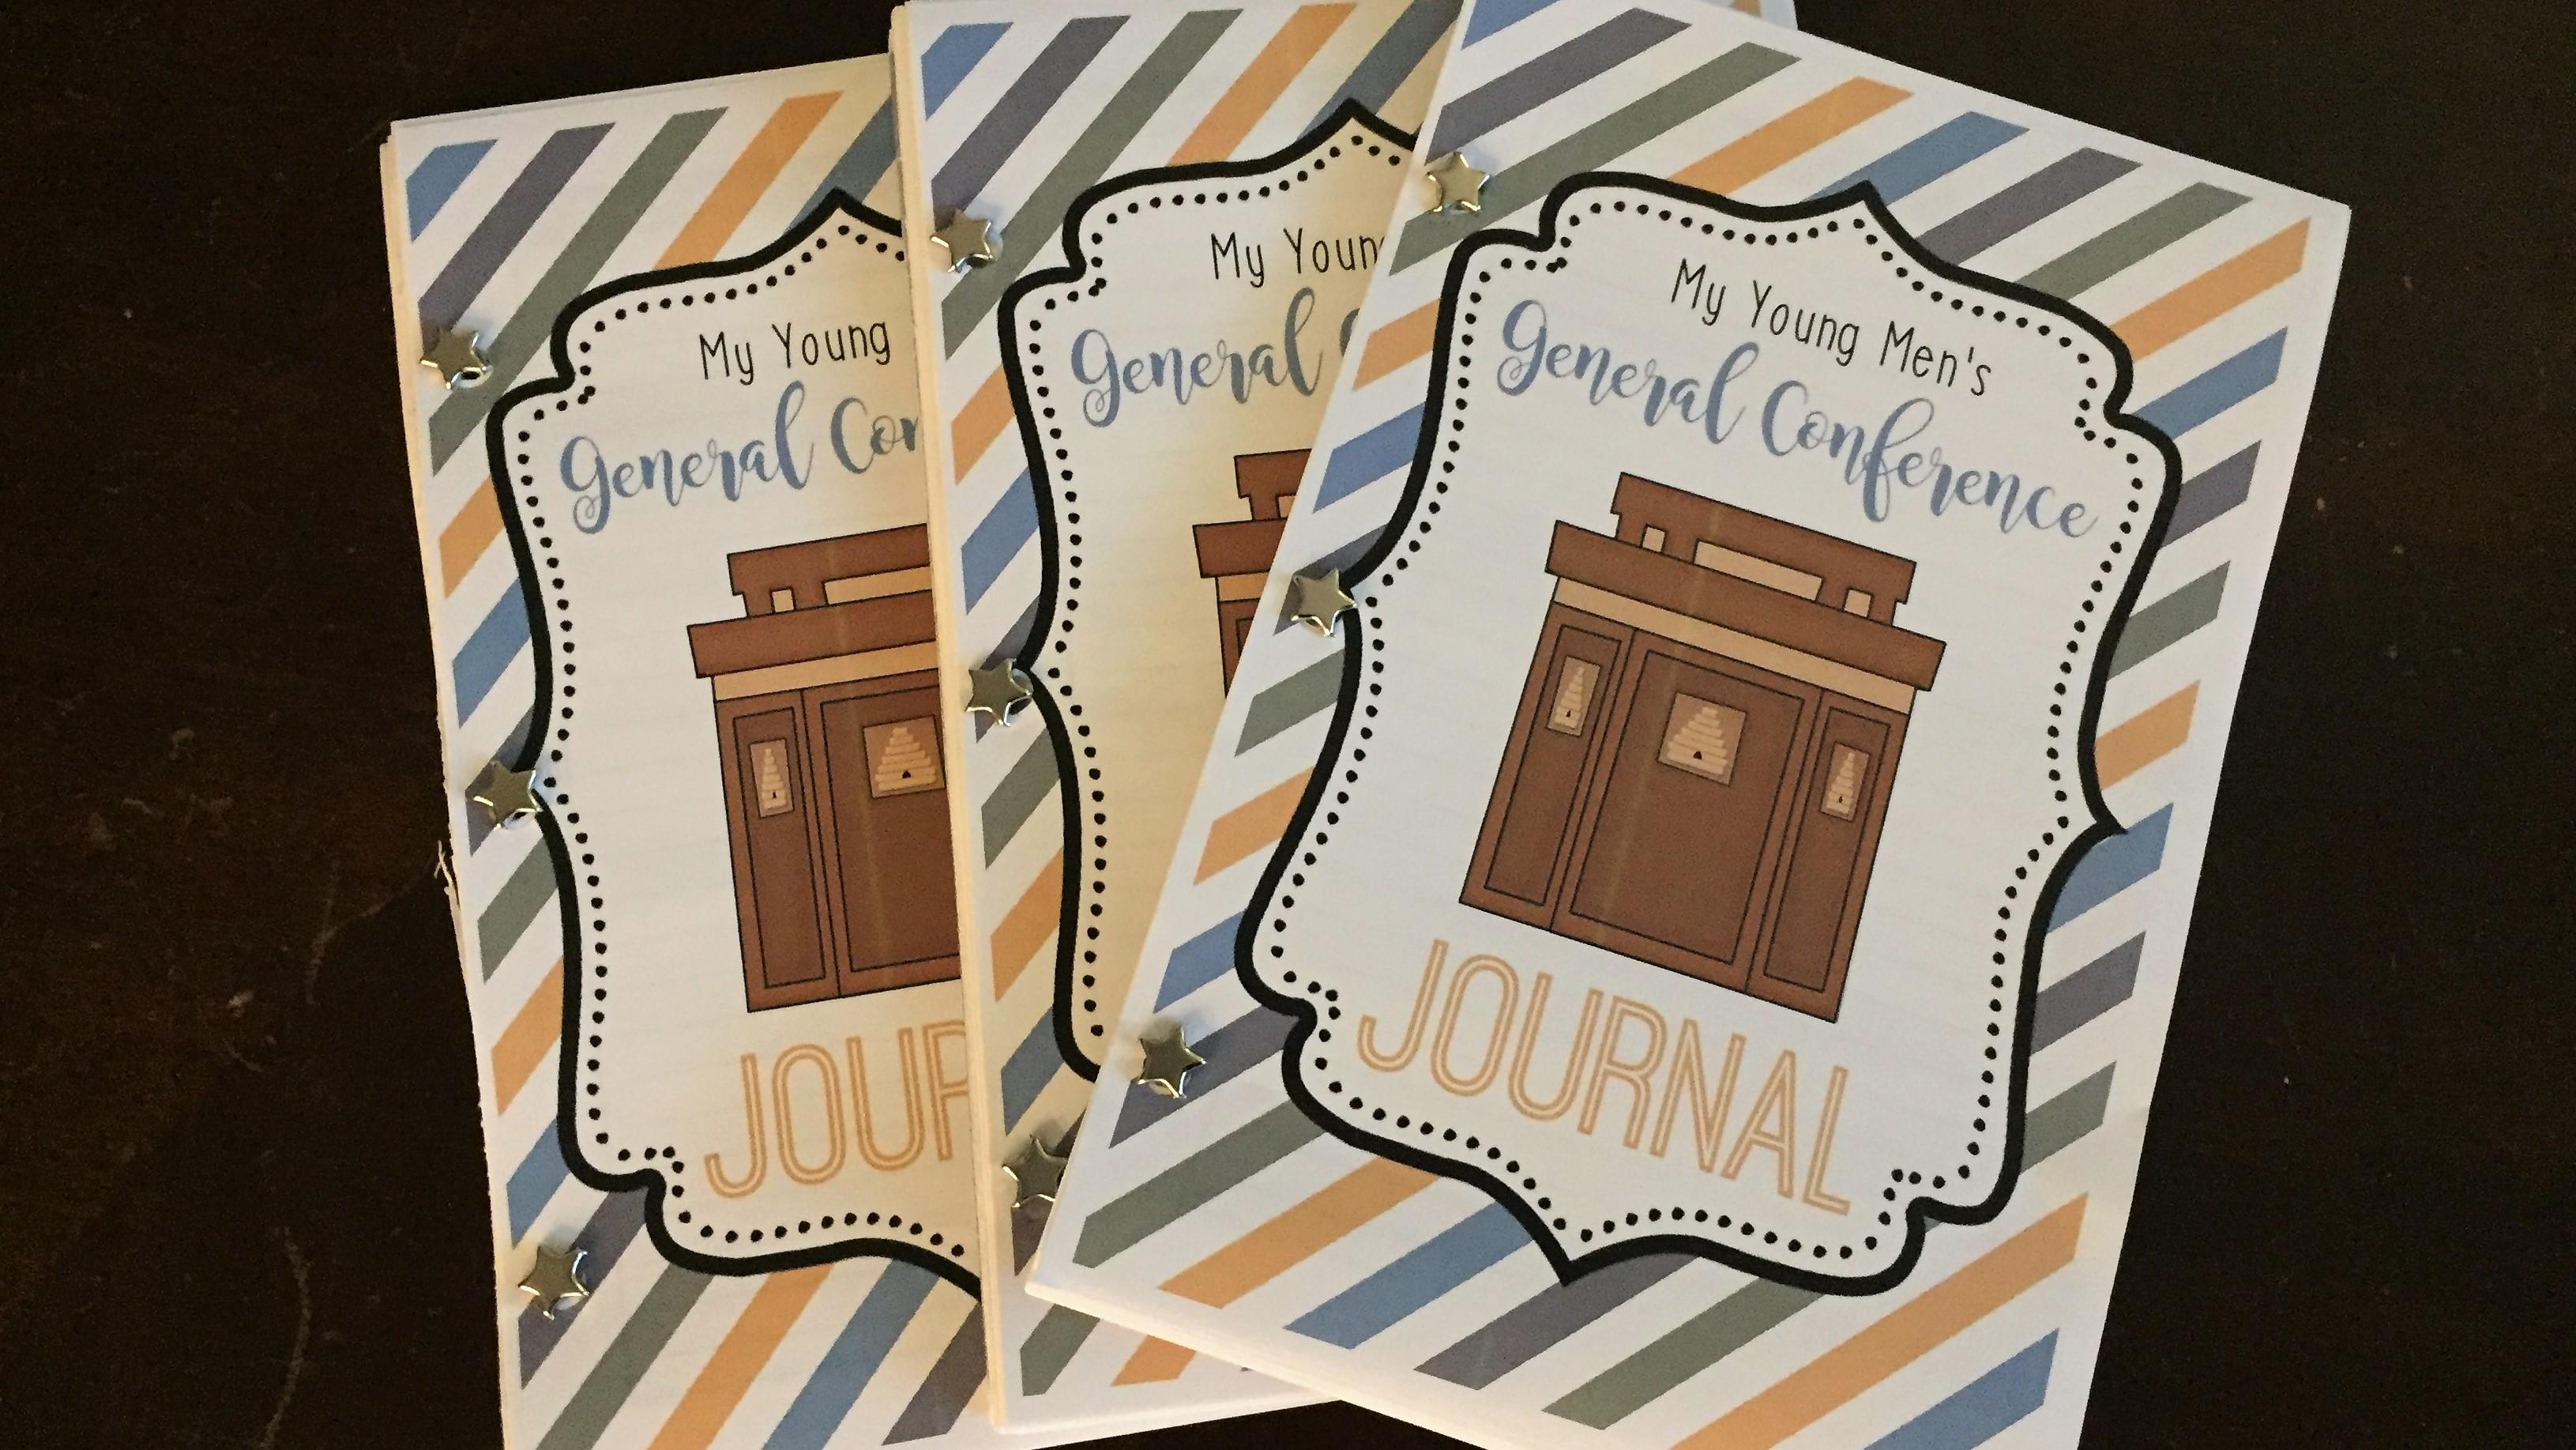 Help Young Men Enjoy General Conference Booklets